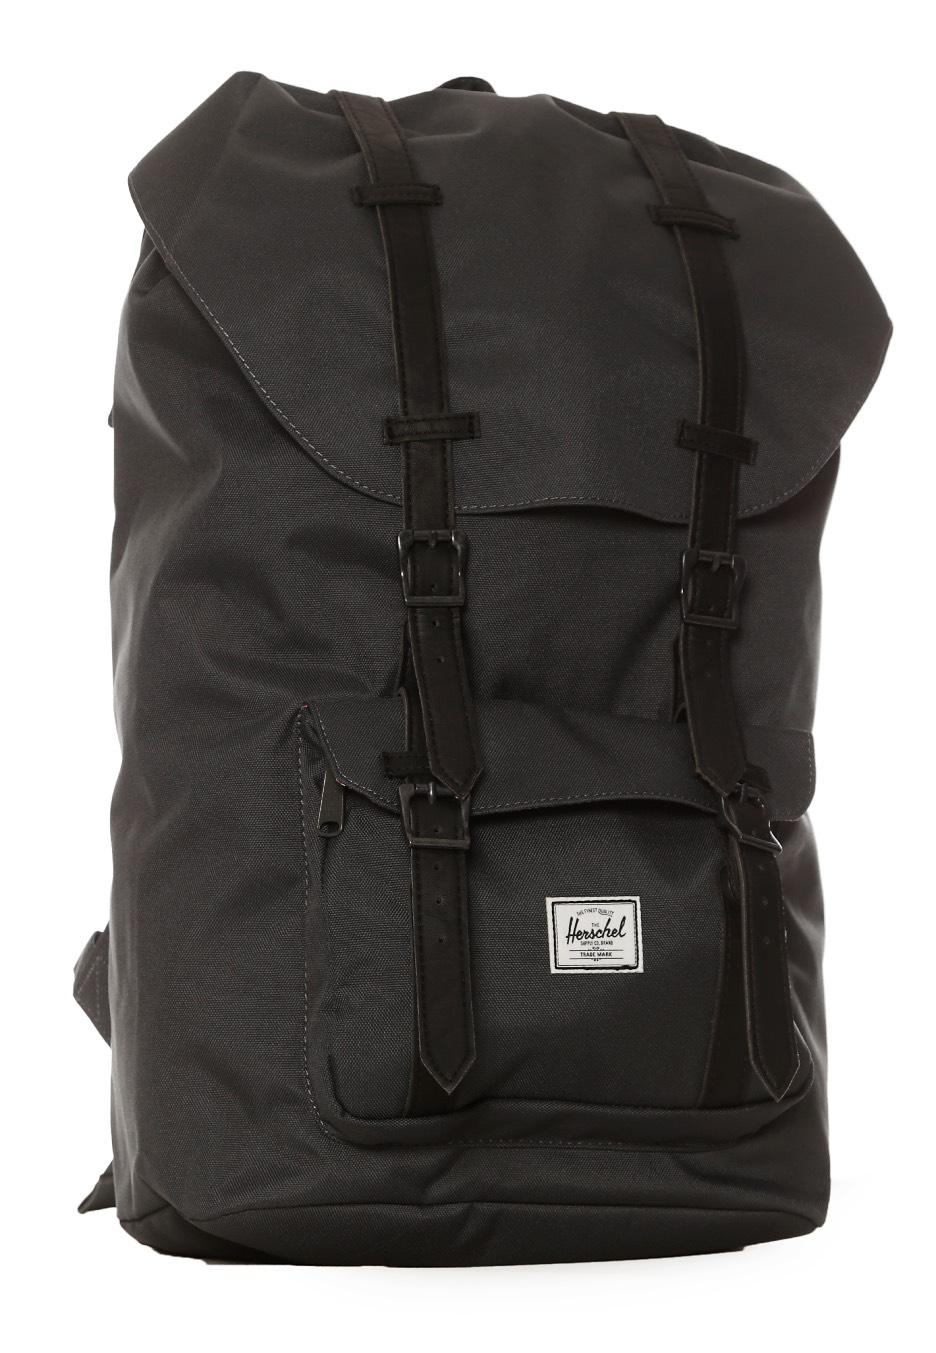 Herschel - Little America Dark Shadow Black Synthetic Leather - Backpack -  Streetwear Shop - Impericon.com UK 44166dabb1